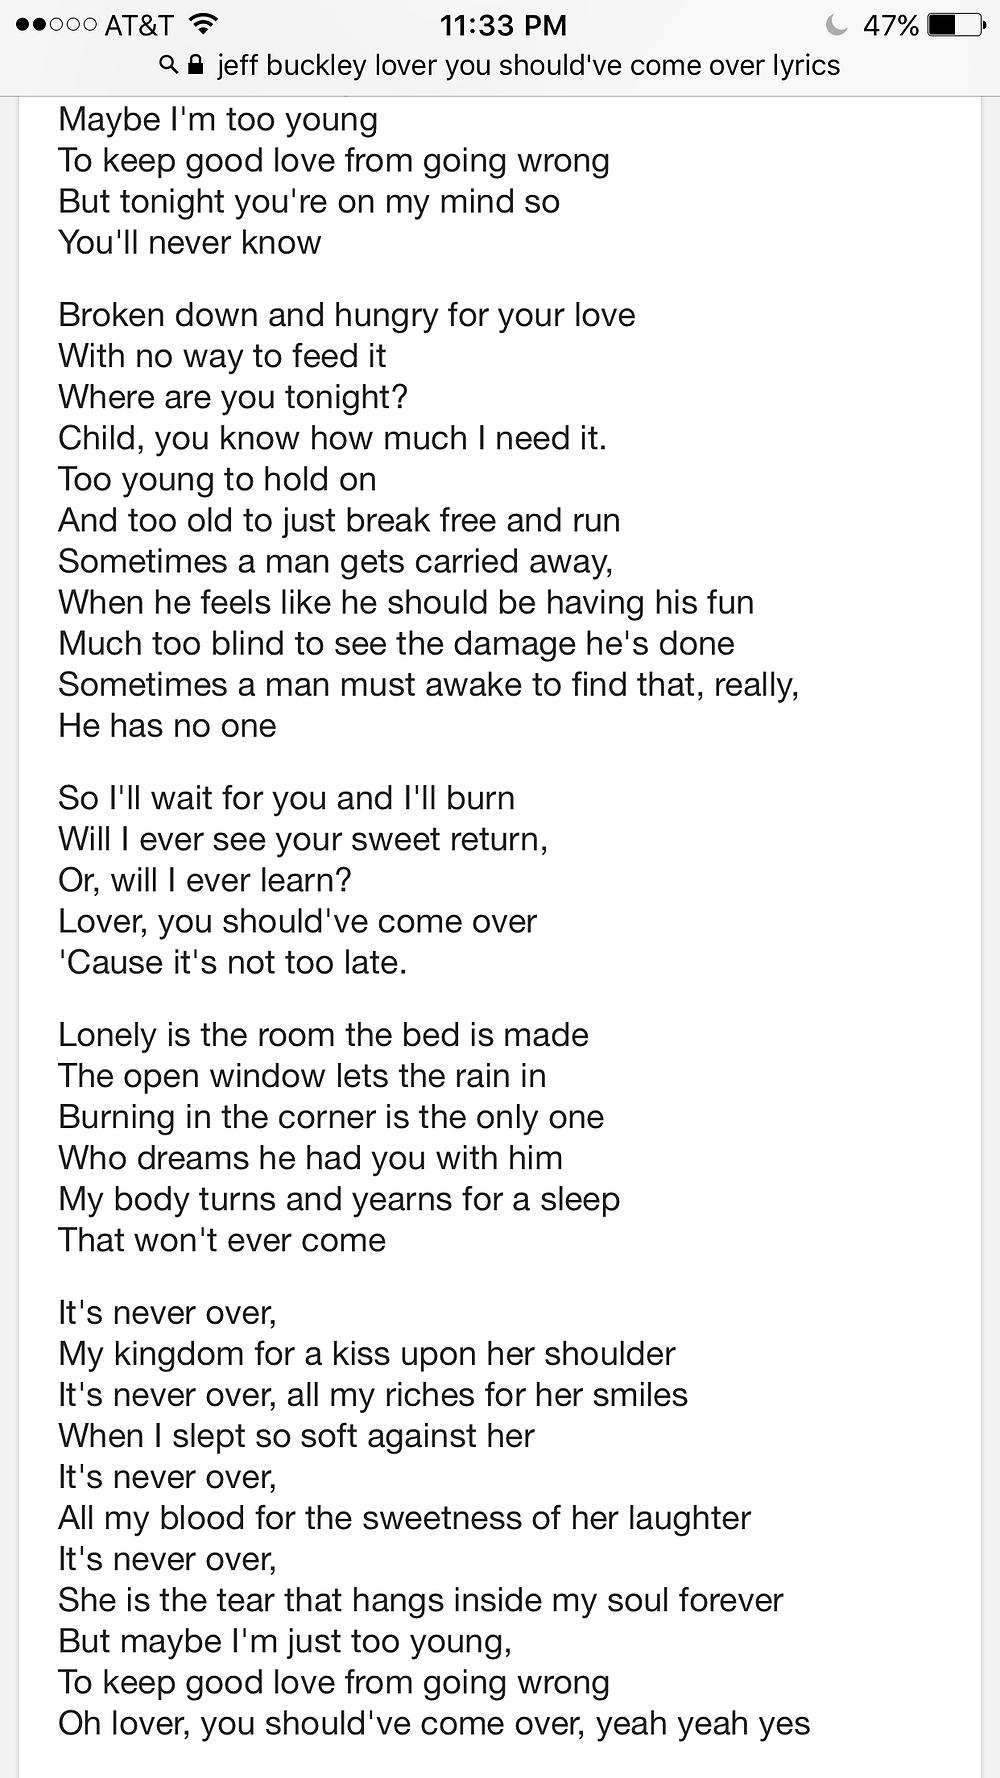 lyrics to a corny Jeff Buckley song